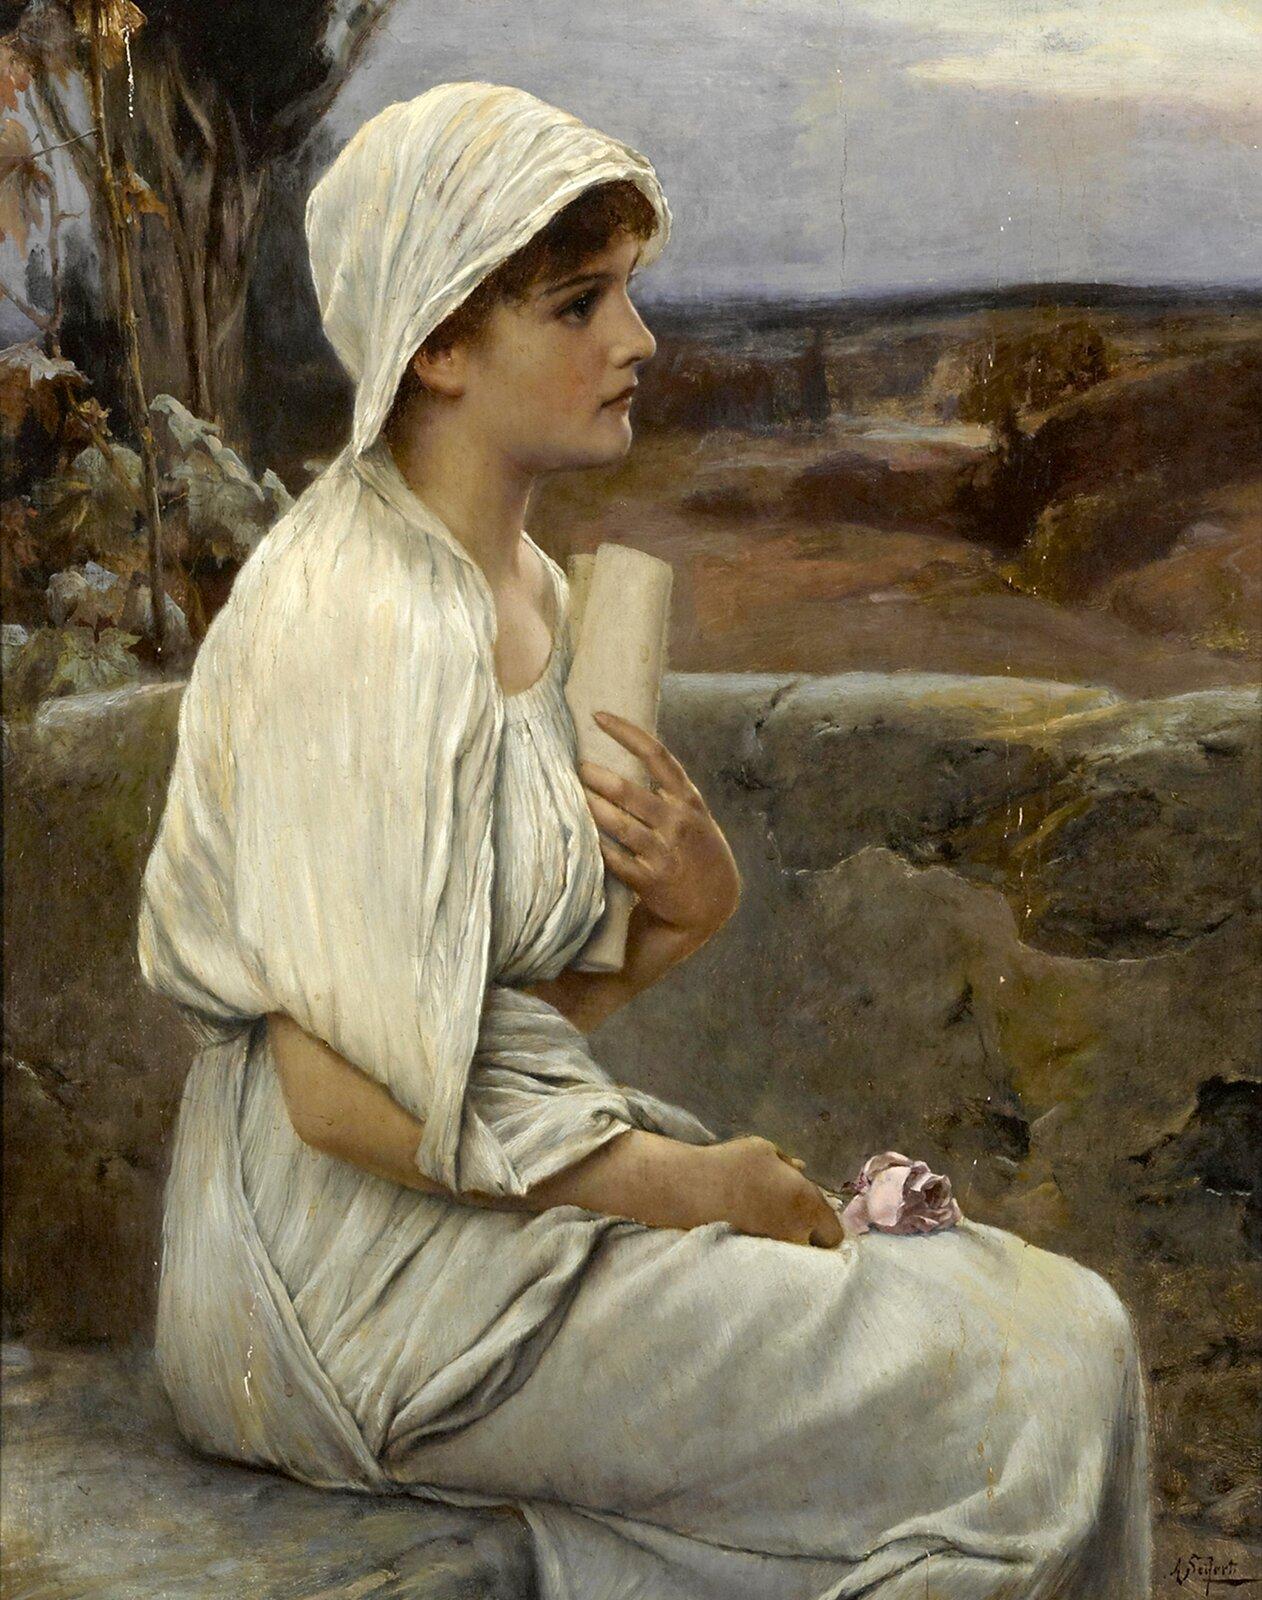 Hypatia zAleksandrii, obraz Alfreda Seiferta